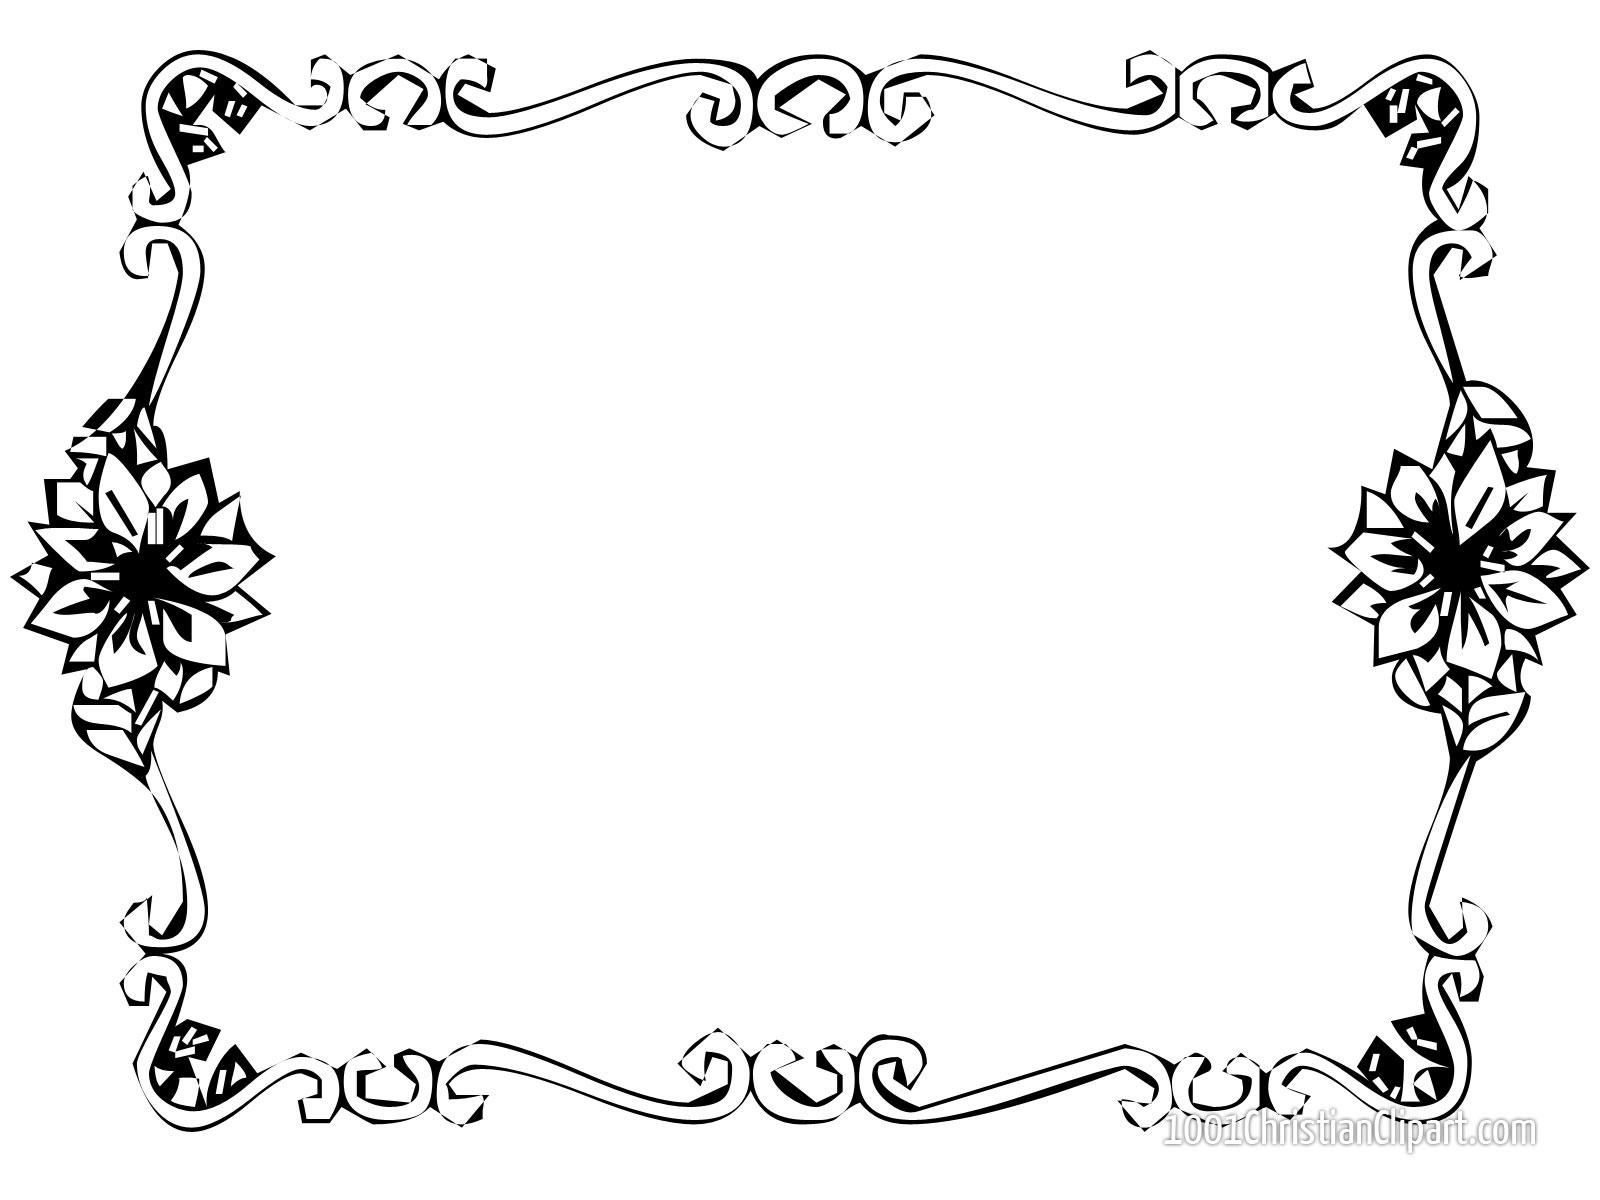 Free DOWNLOAD BORDER, Download Free Clip Art, Free Clip Art.